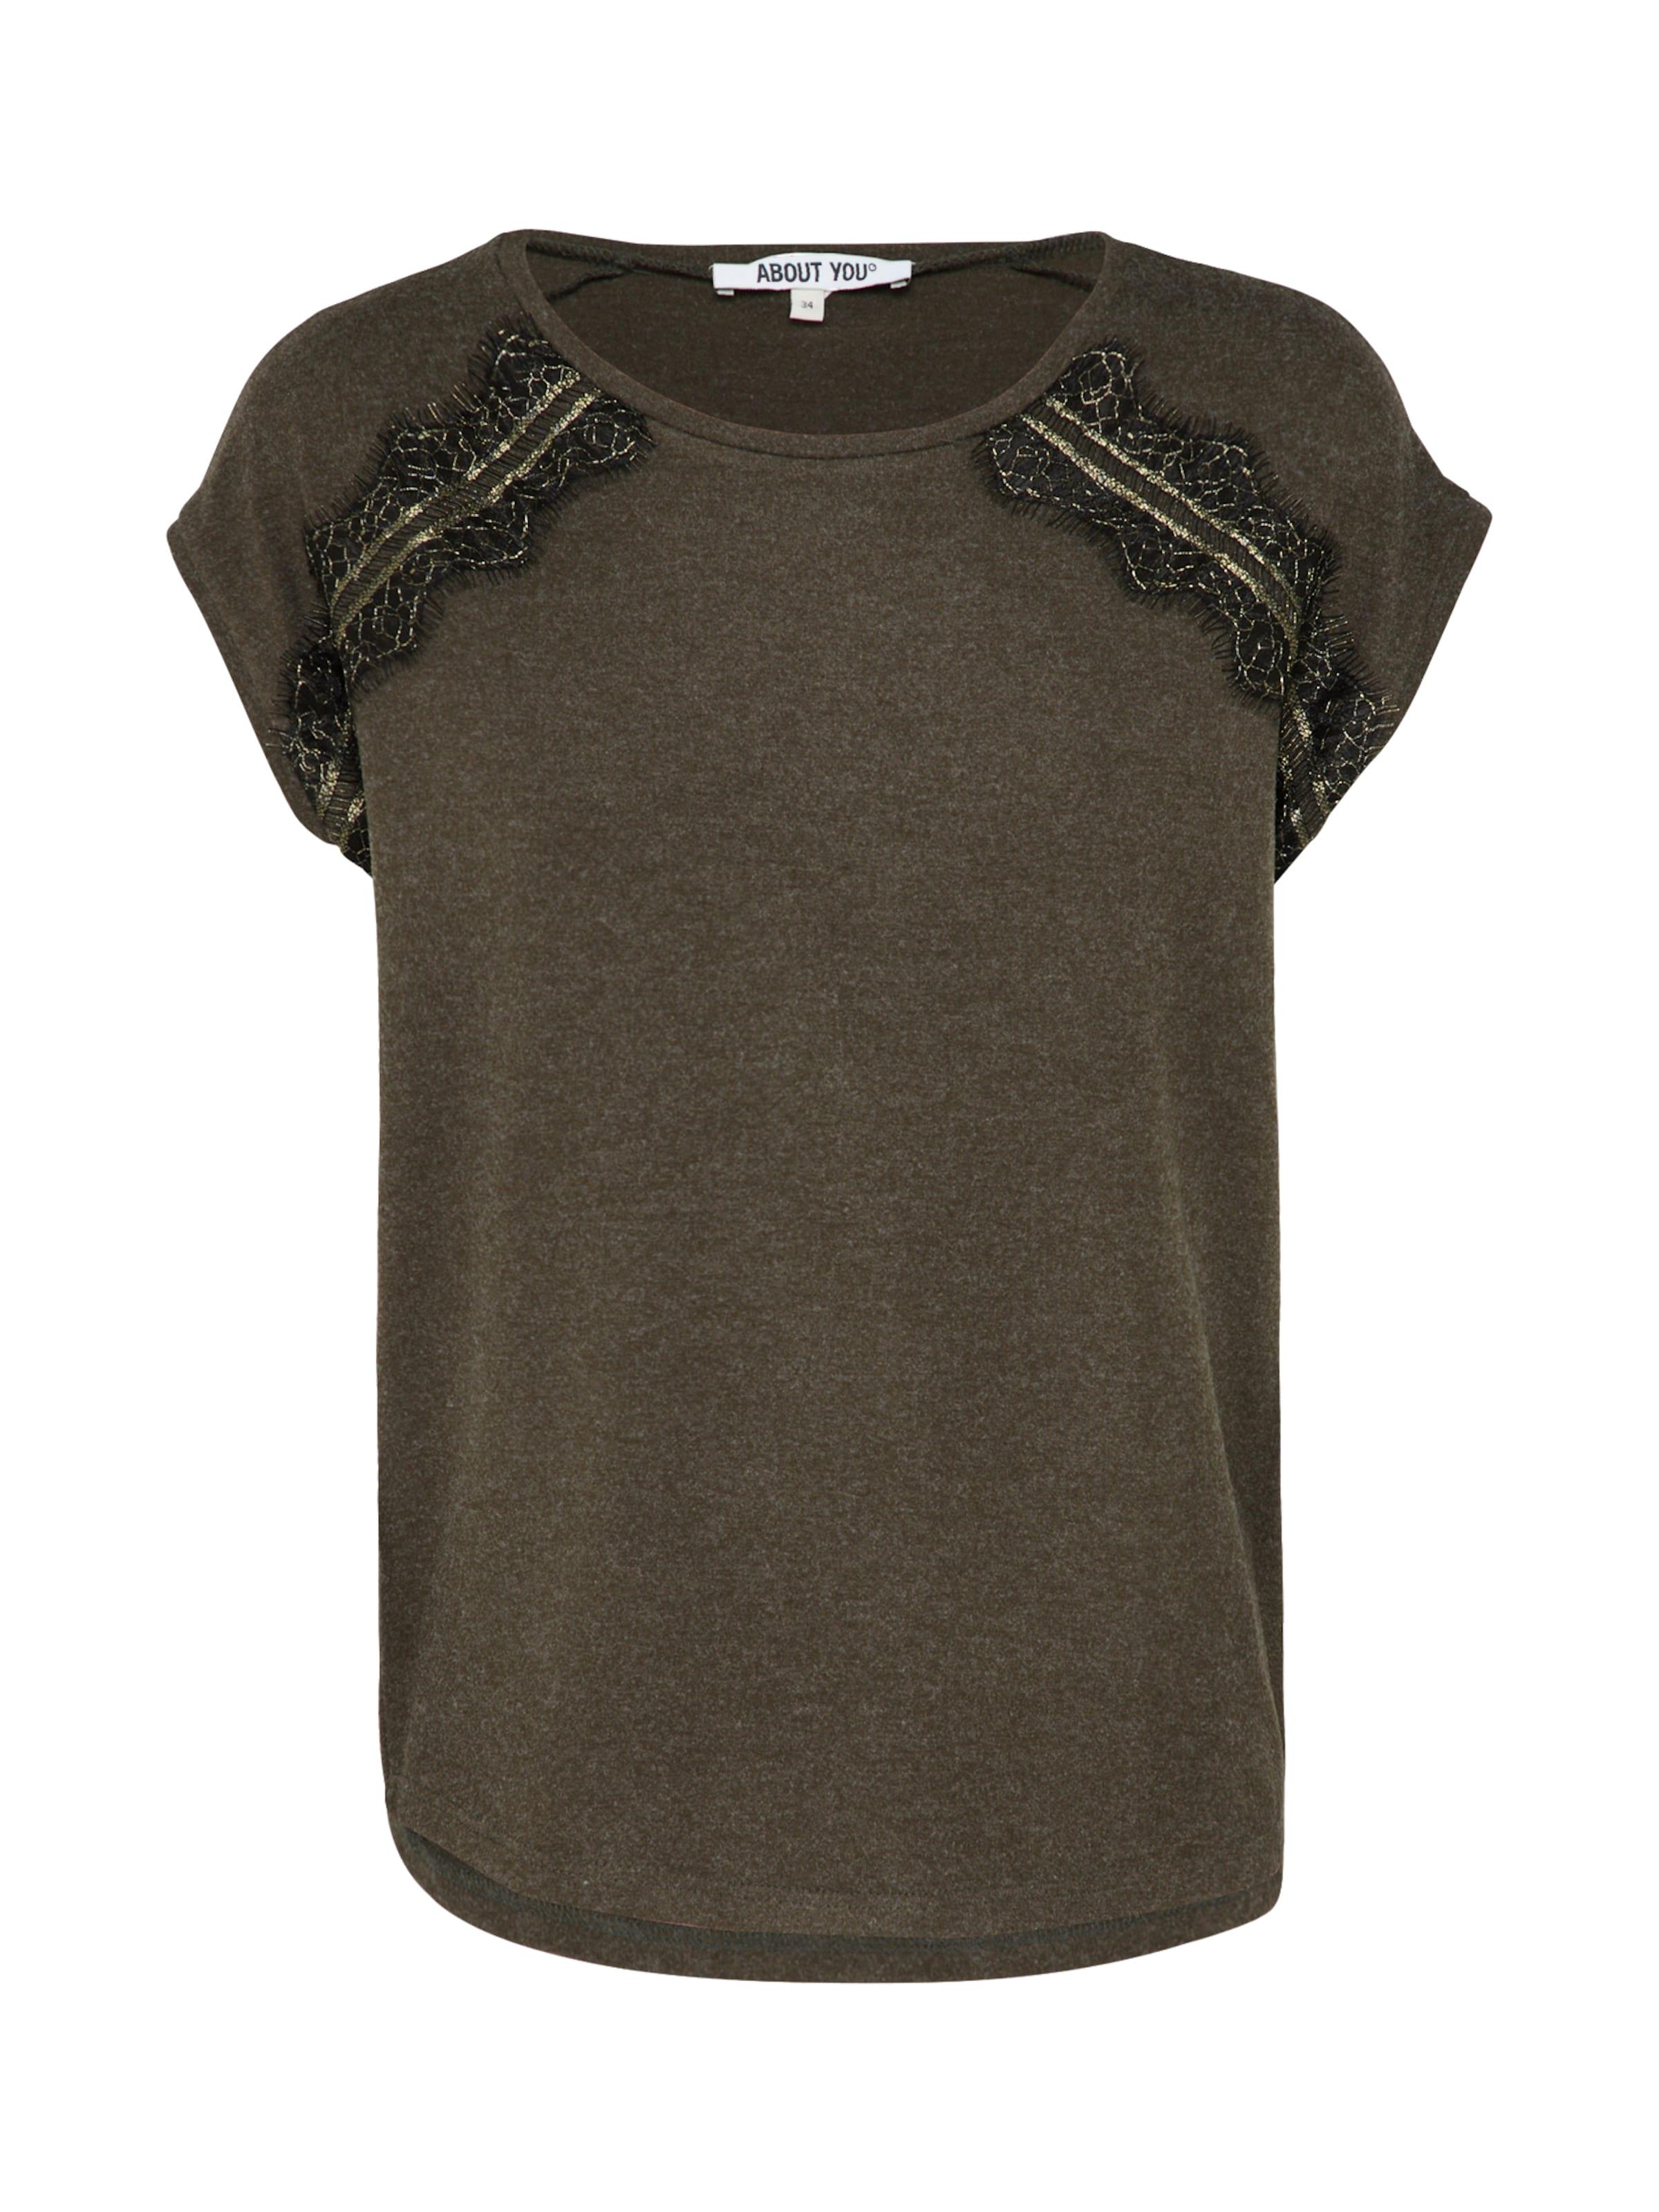 Shirt Olijfgroen Olijfgroen In Shirt 'naja' 'naja' Shirt Olijfgroen 'naja' In In FlJ3K1Tc